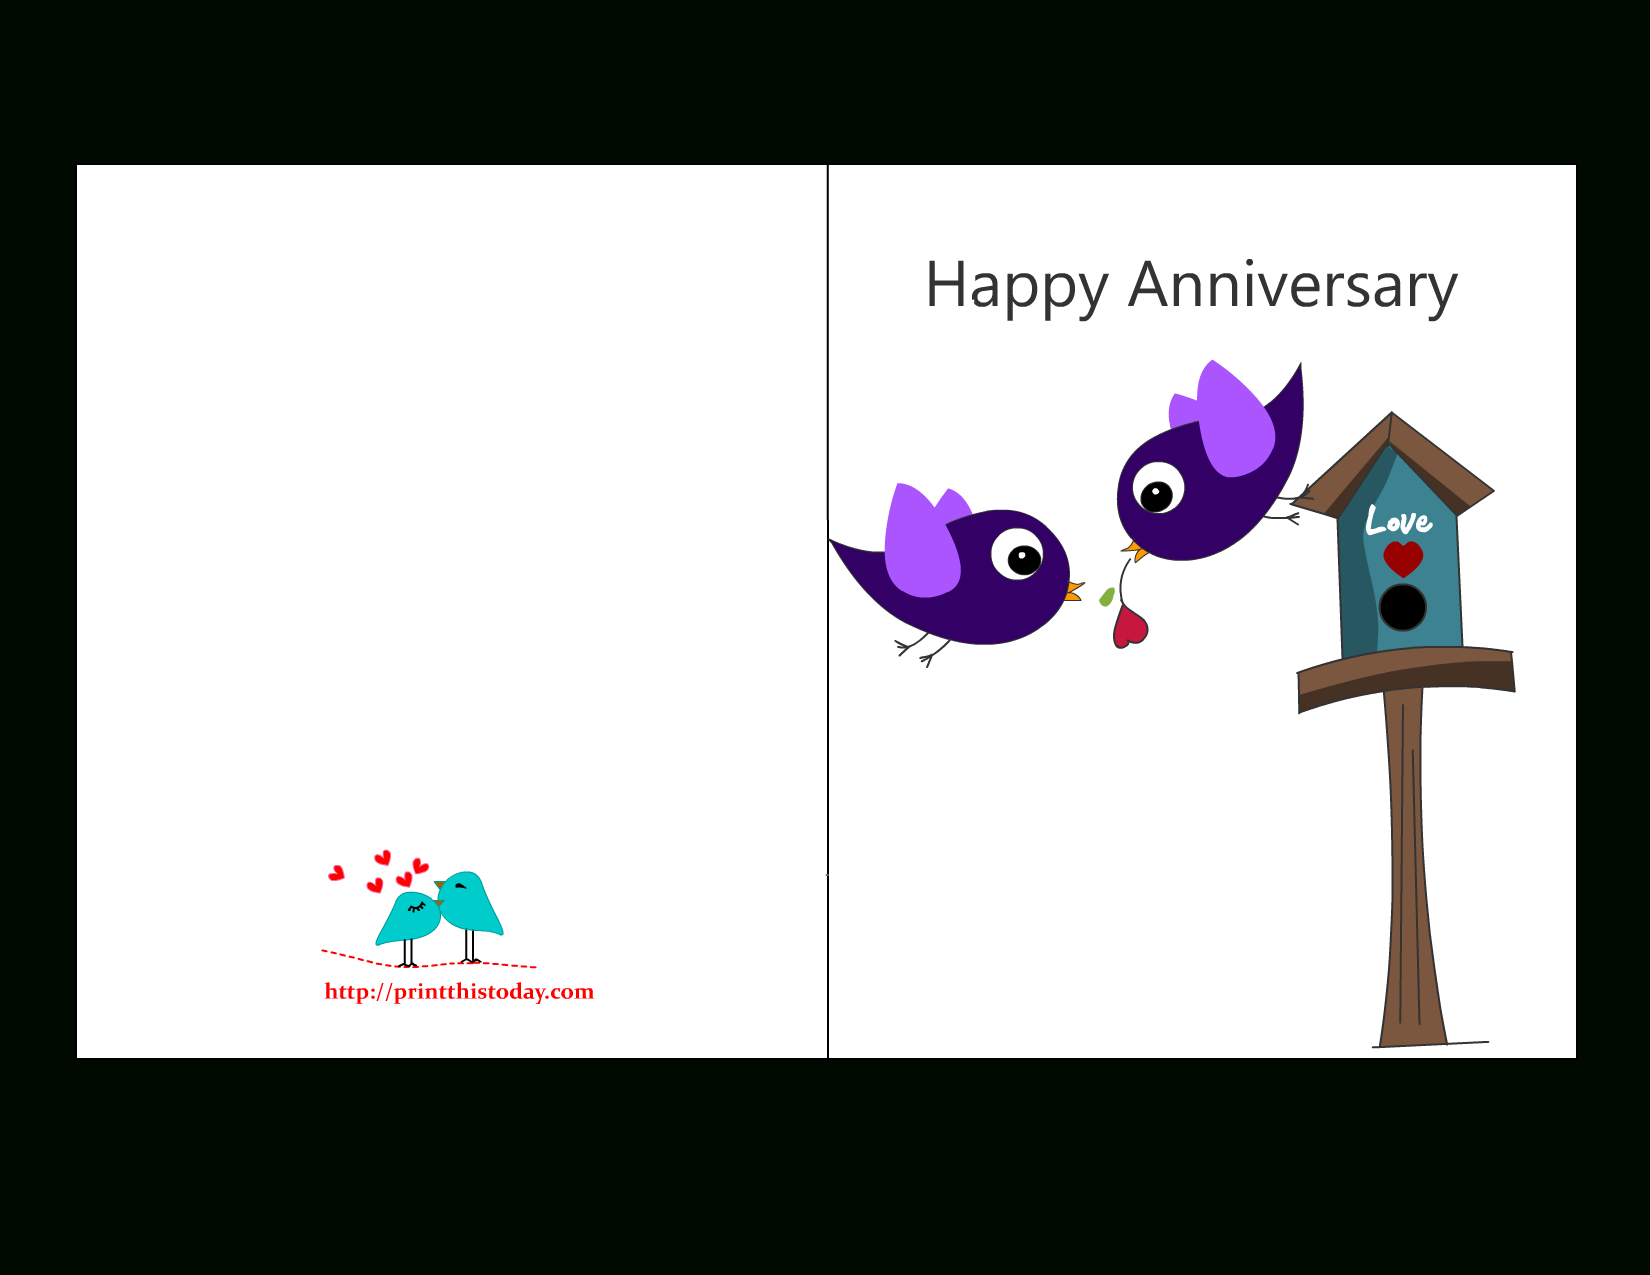 Free Anniversary Cards To Print | Free Printable Anniversary Cards - Free Printable Cards